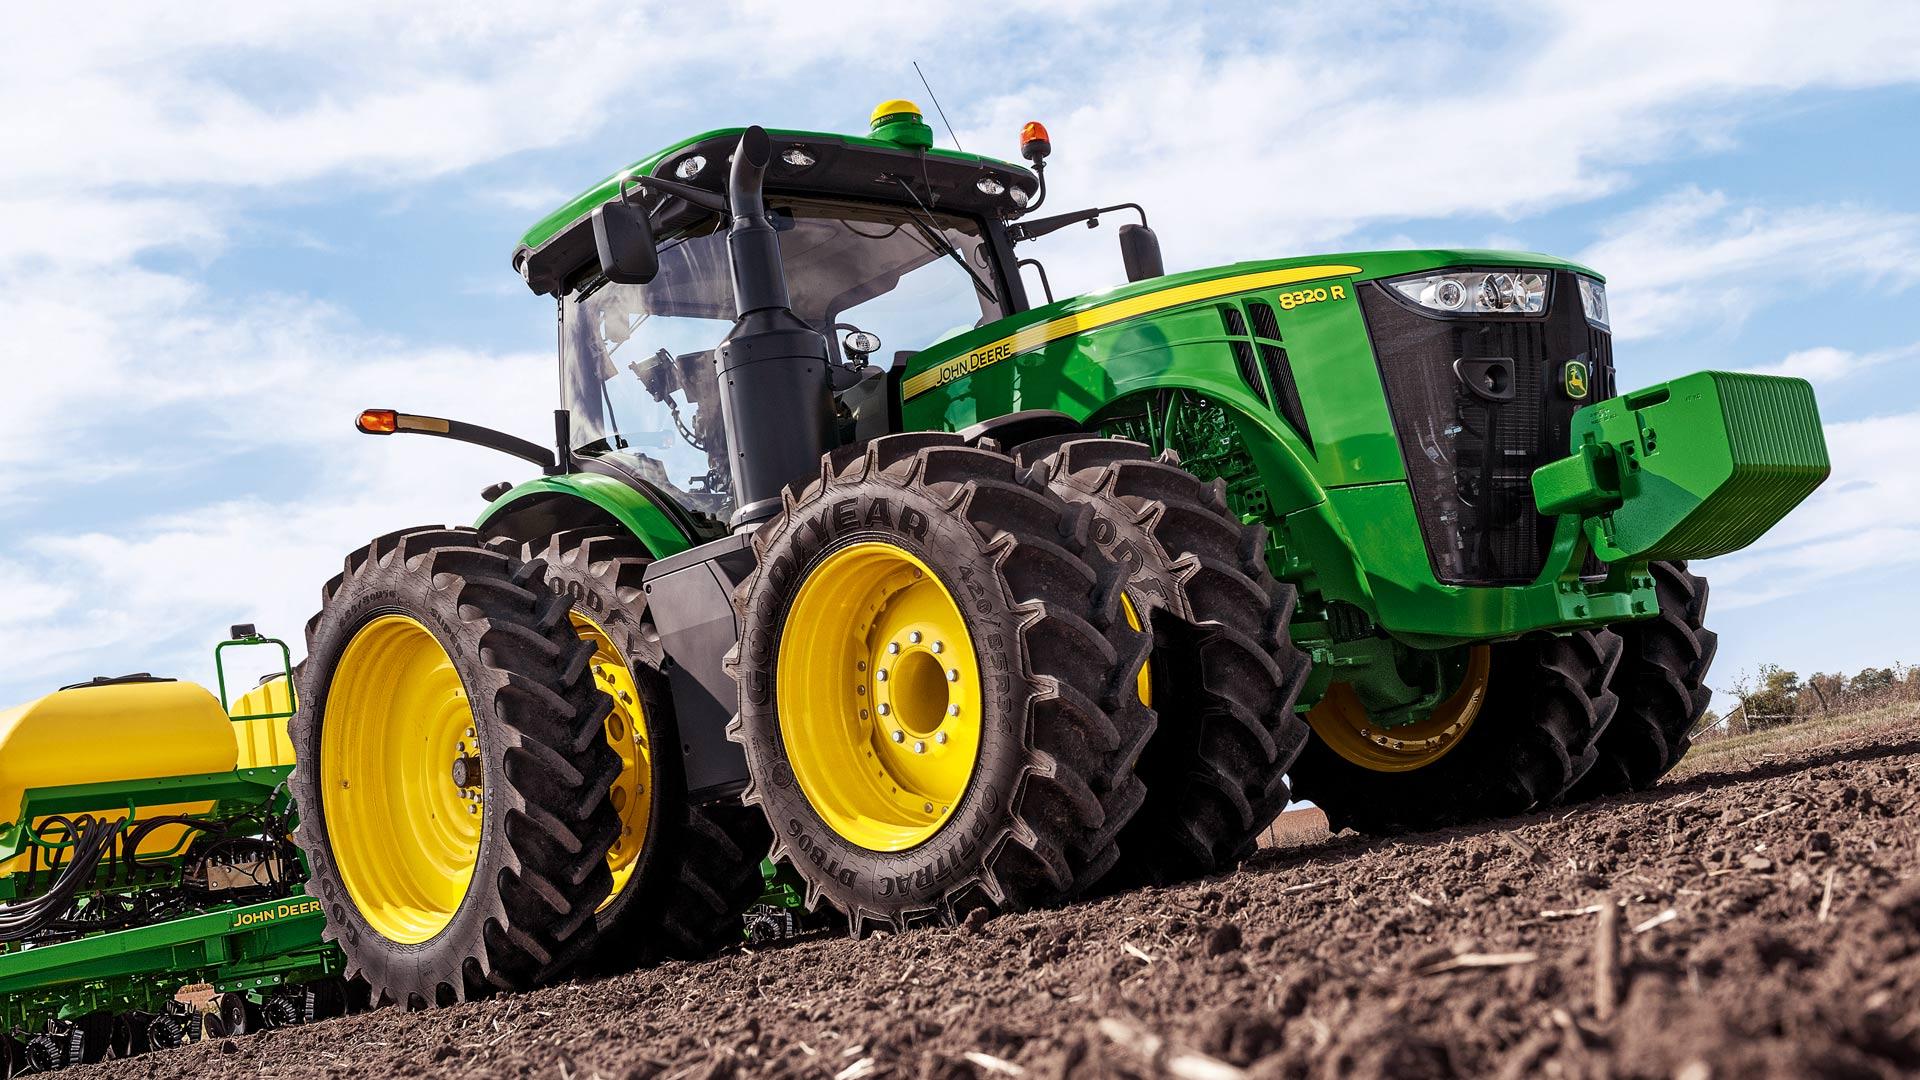 John Deere Side By Side >> John Deere Tractors | Row Crop Tractors | John Deere CA